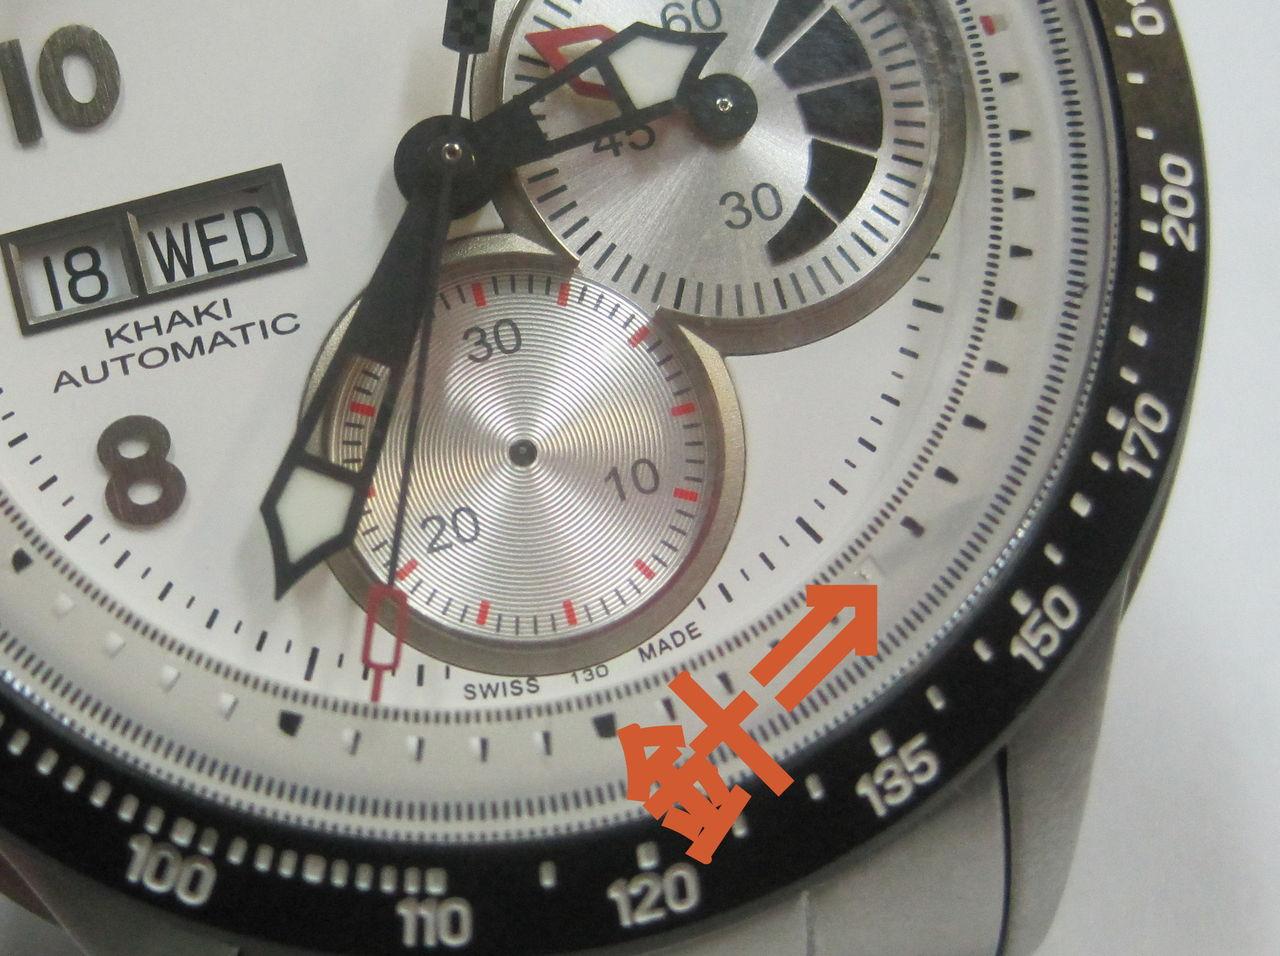 f55d571e5f 時計クリーニング.COM / ビフォー&アフター : ハミルトン・カーキ ...